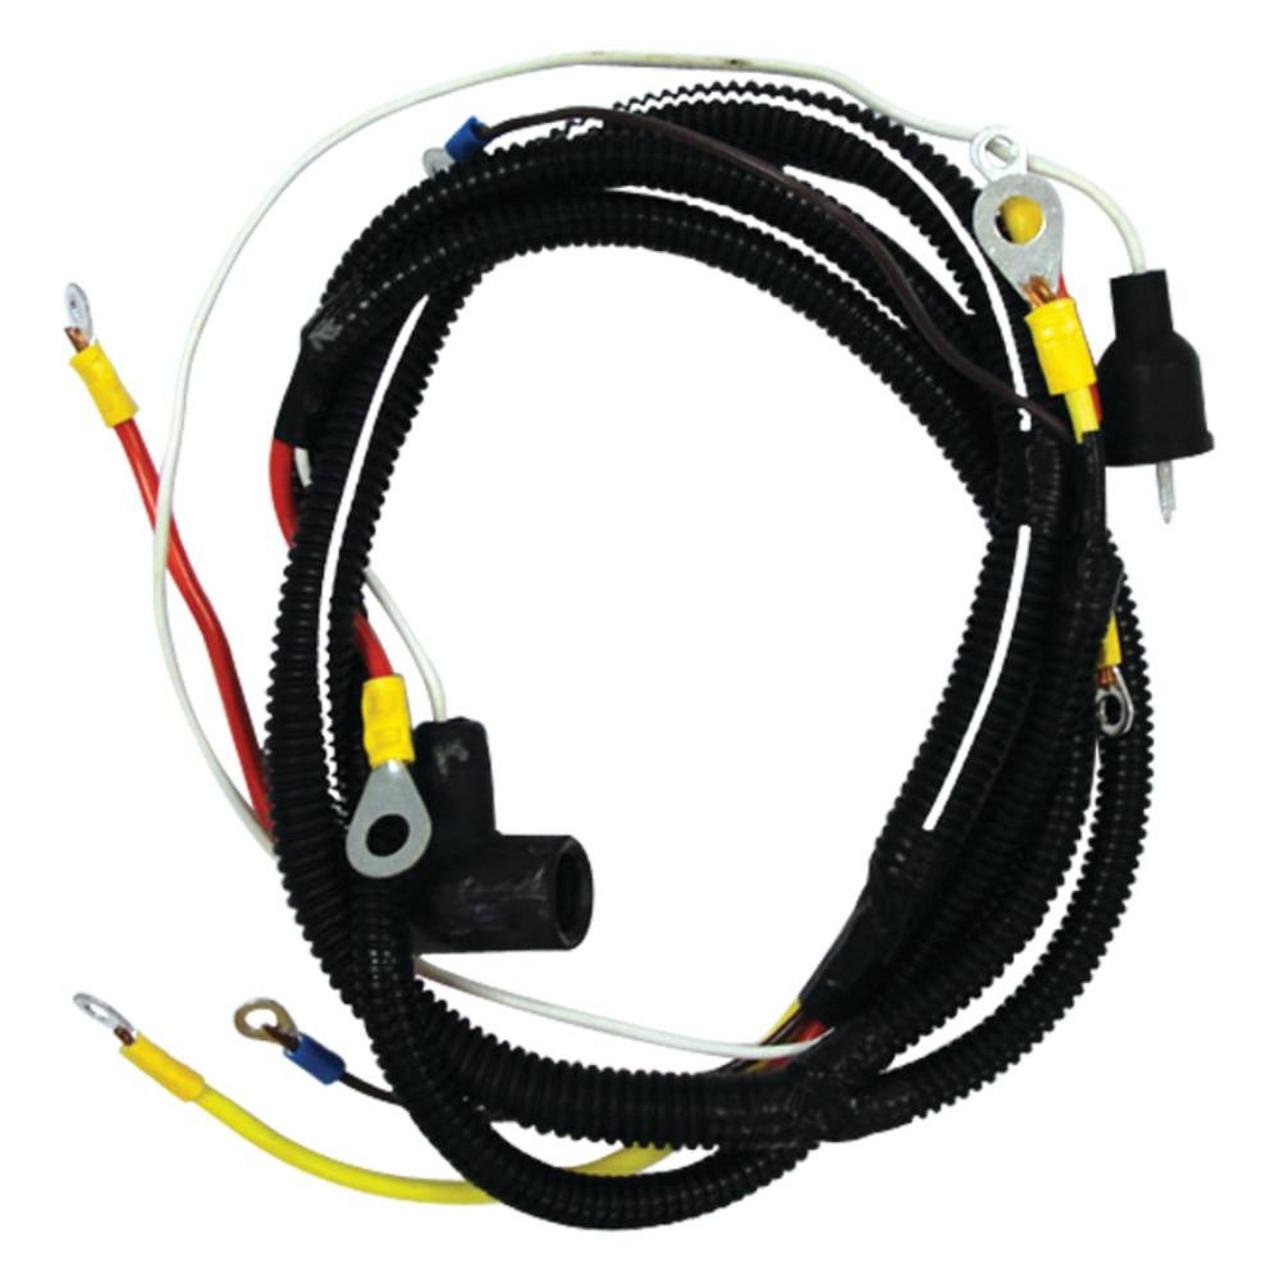 medium resolution of 2n 8n front dist tractor 12v alt alternator wiring harness 8ne10301 2n 8n front dist tractor 12v alt alternator wiring harness 8ne10301